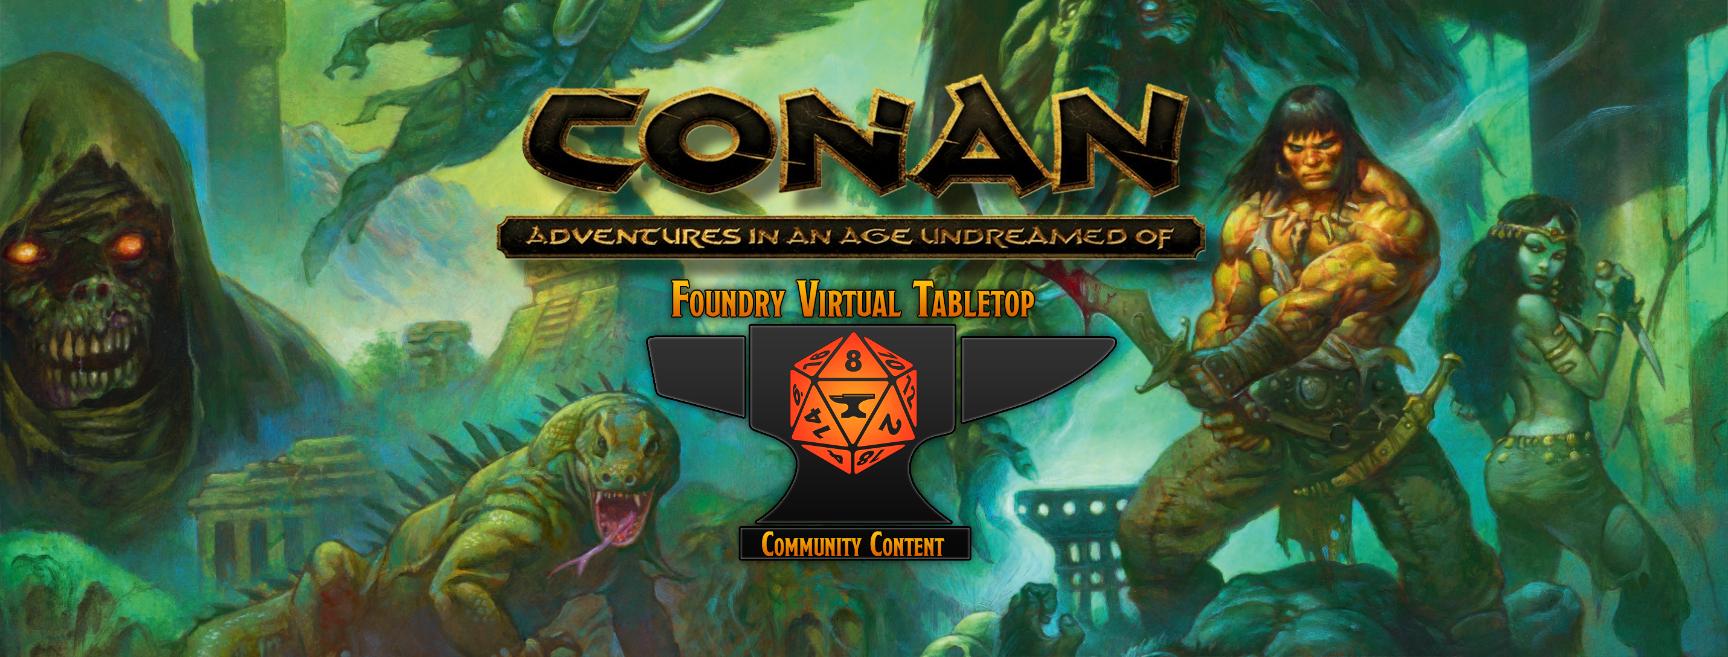 Robert E. Howard's CONAN banner with mosaic of Conan inspired elements.